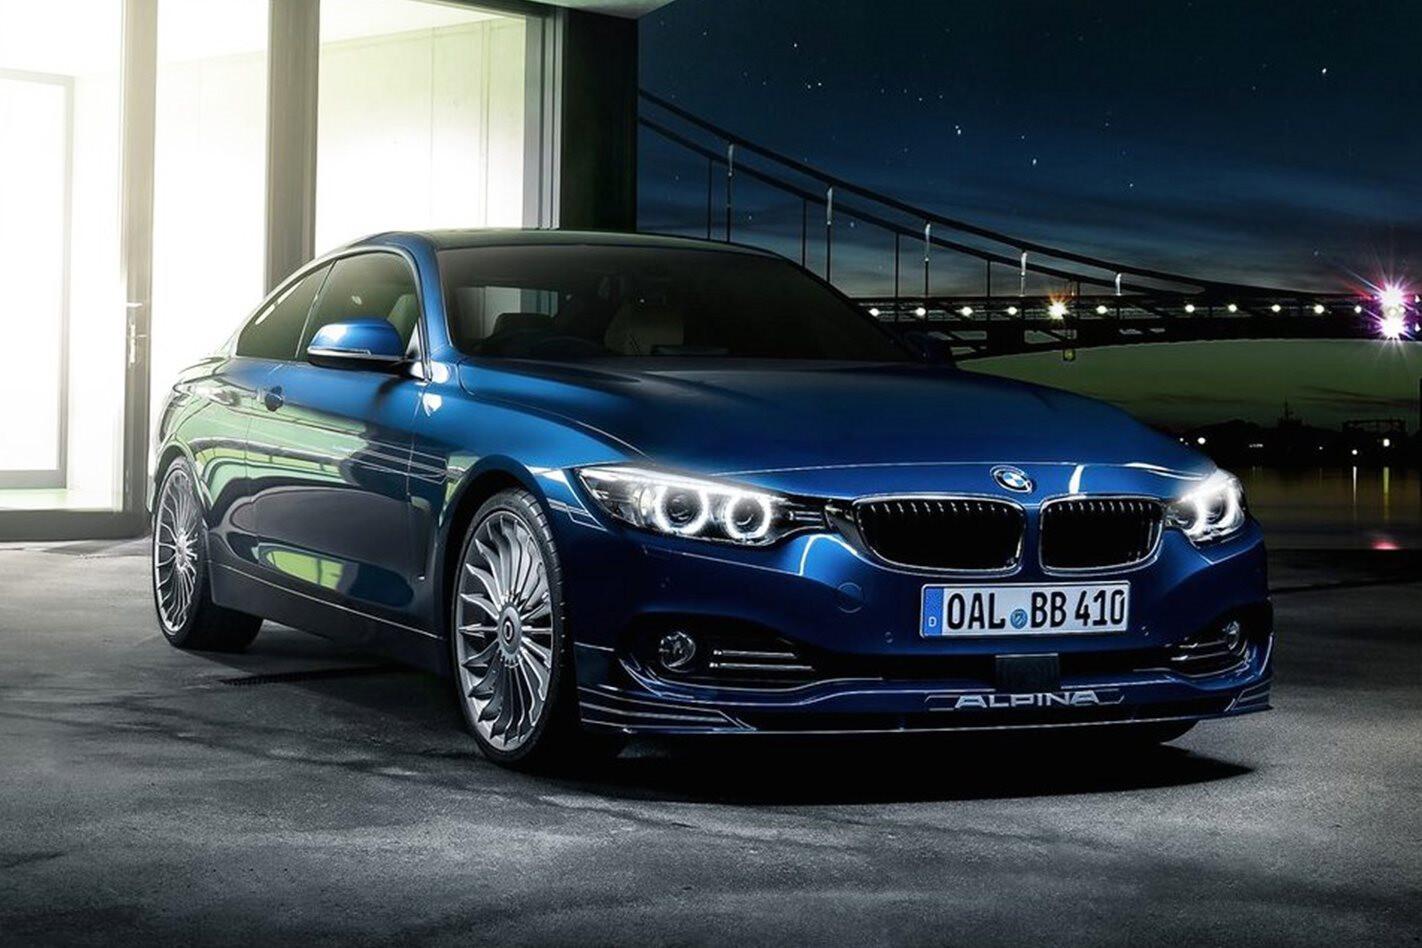 BMW Australia readying 700Nm Alpina models